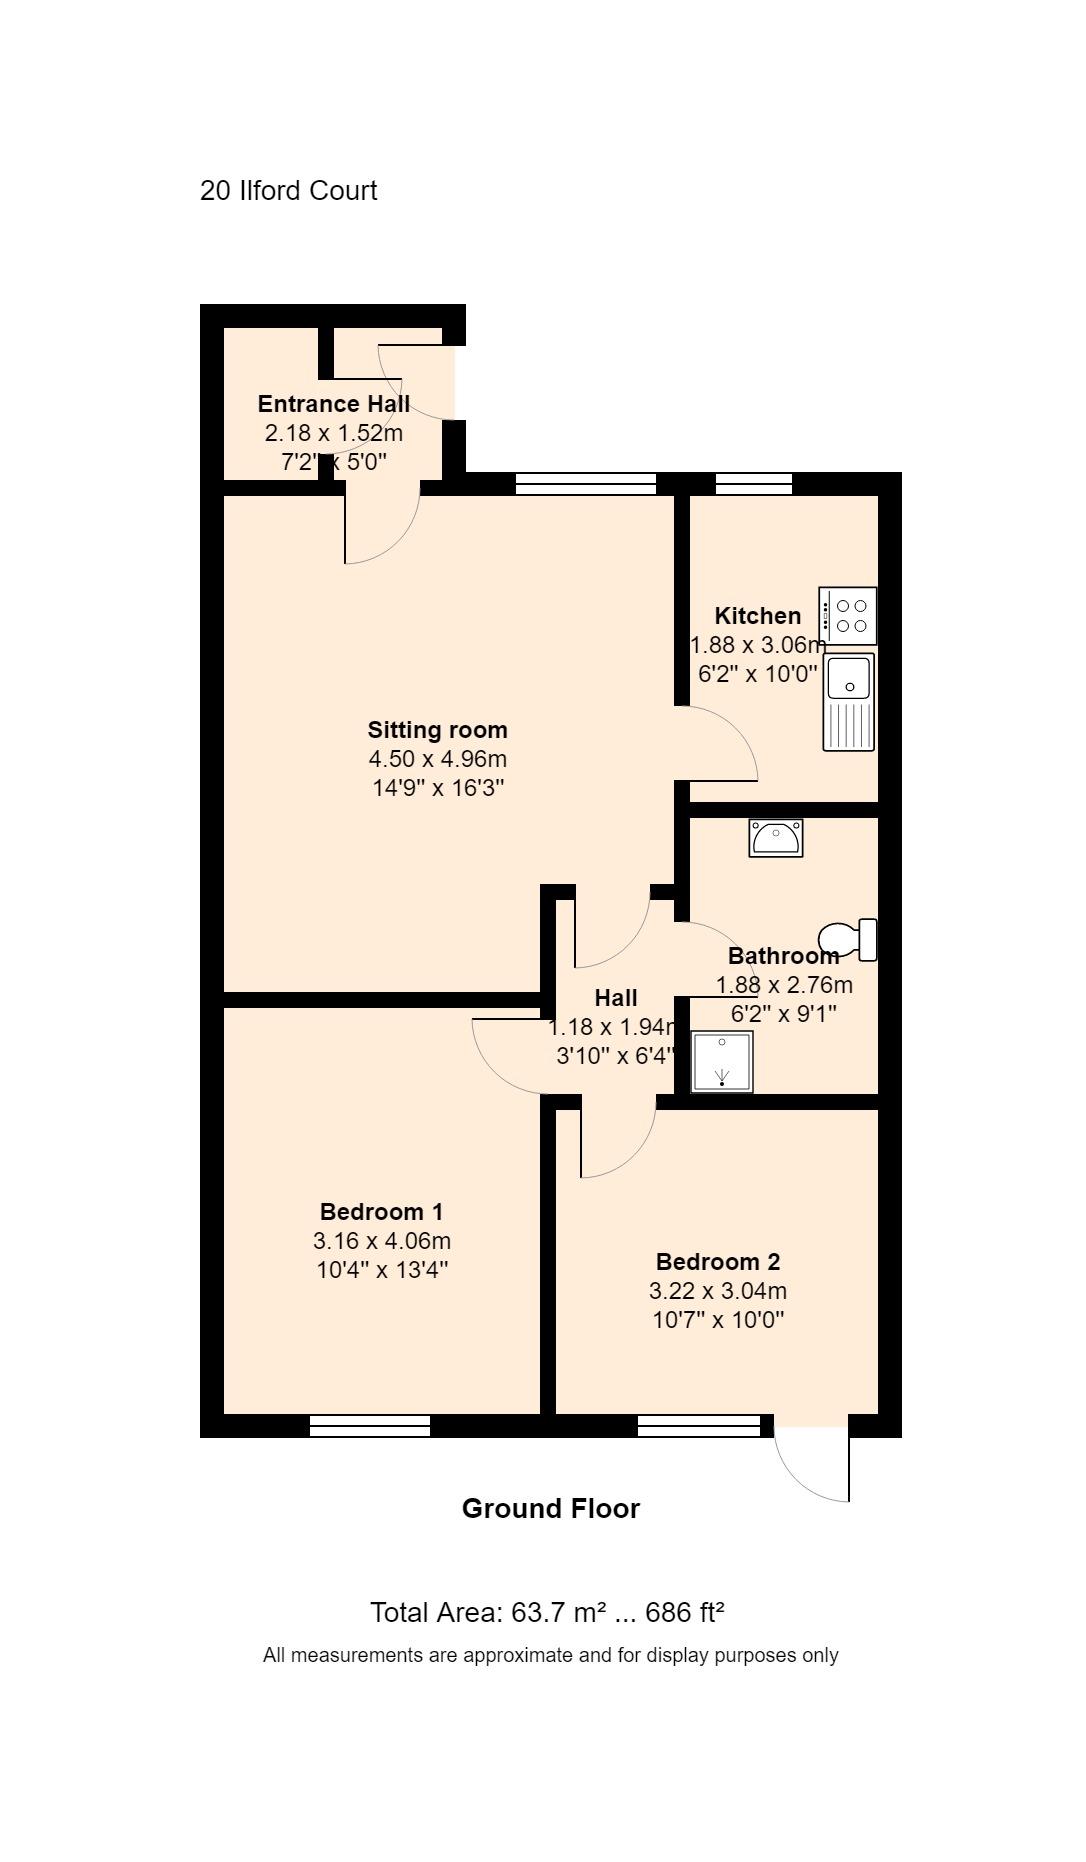 20 Ilford Court Floorplan